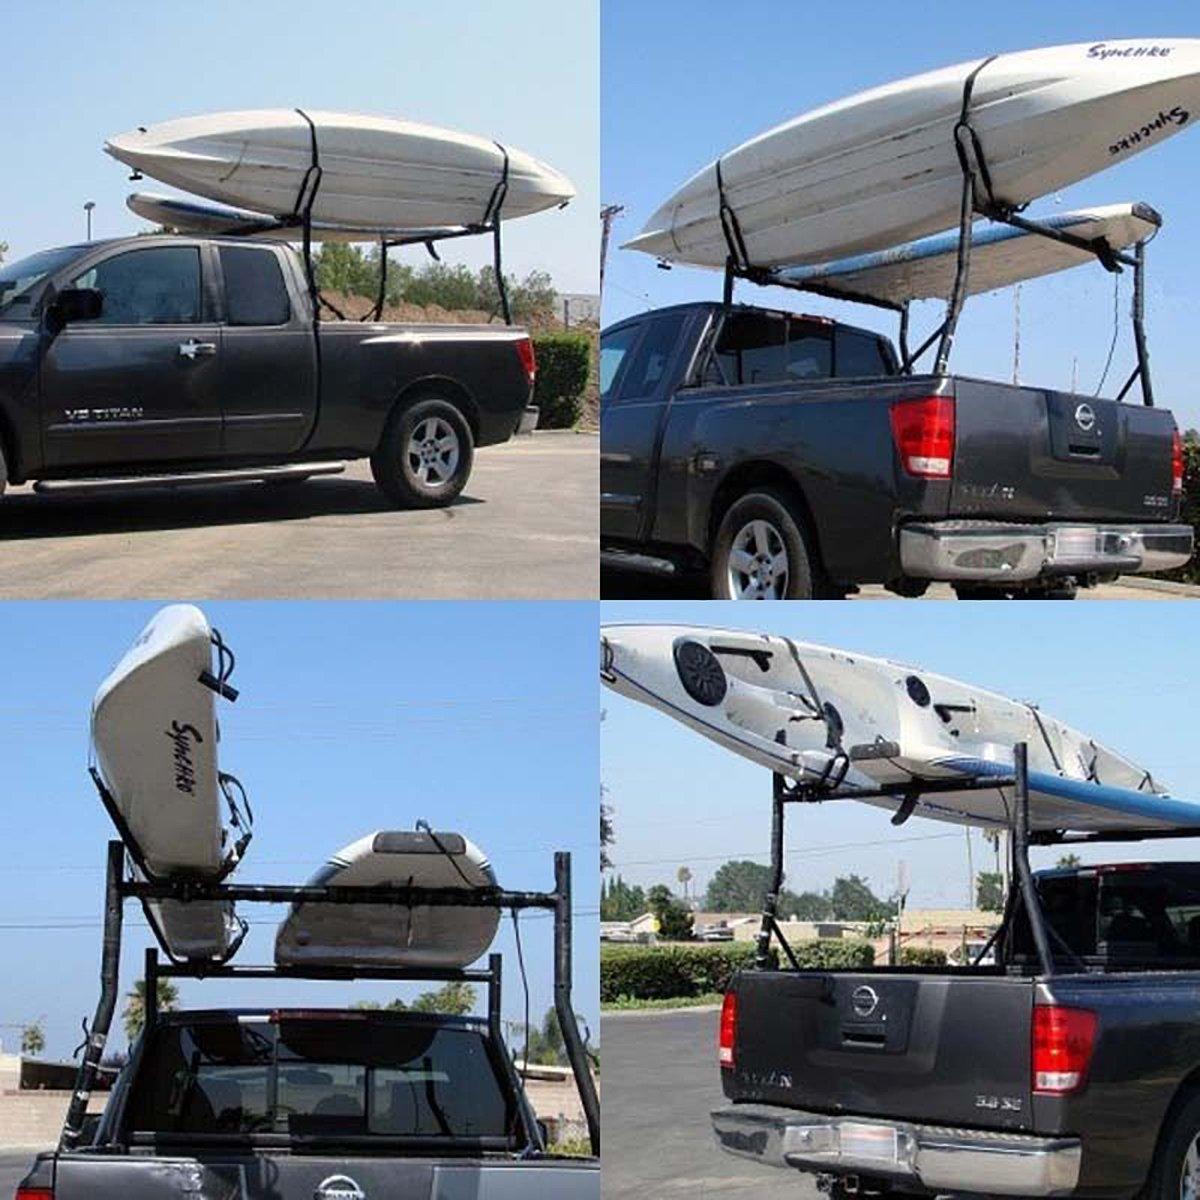 XMT-MOTO J-Bar 2 Pairs Universal Kayak Canoe Top Mount Carrier Roof Rack Boat SUV Van Car